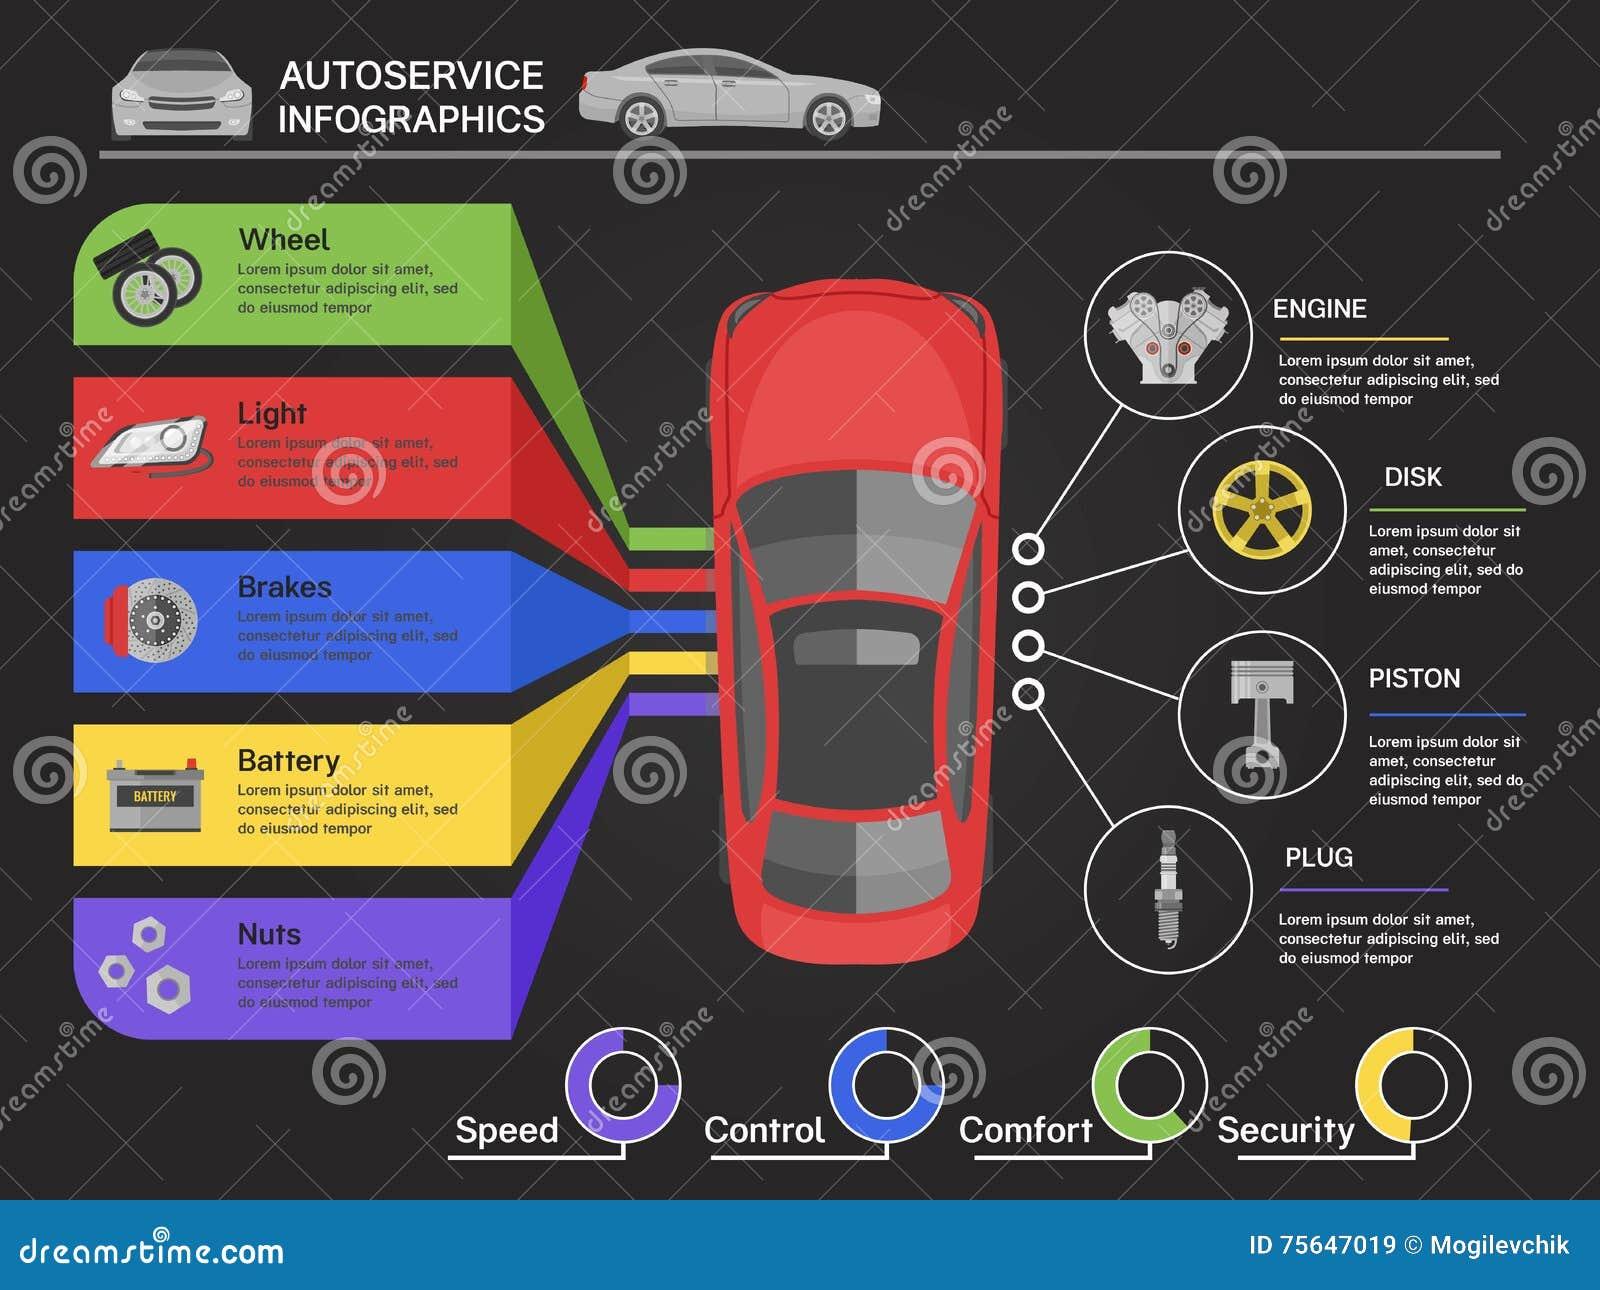 Auto Service Infographics stock vector. Illustration of brake - 75647019